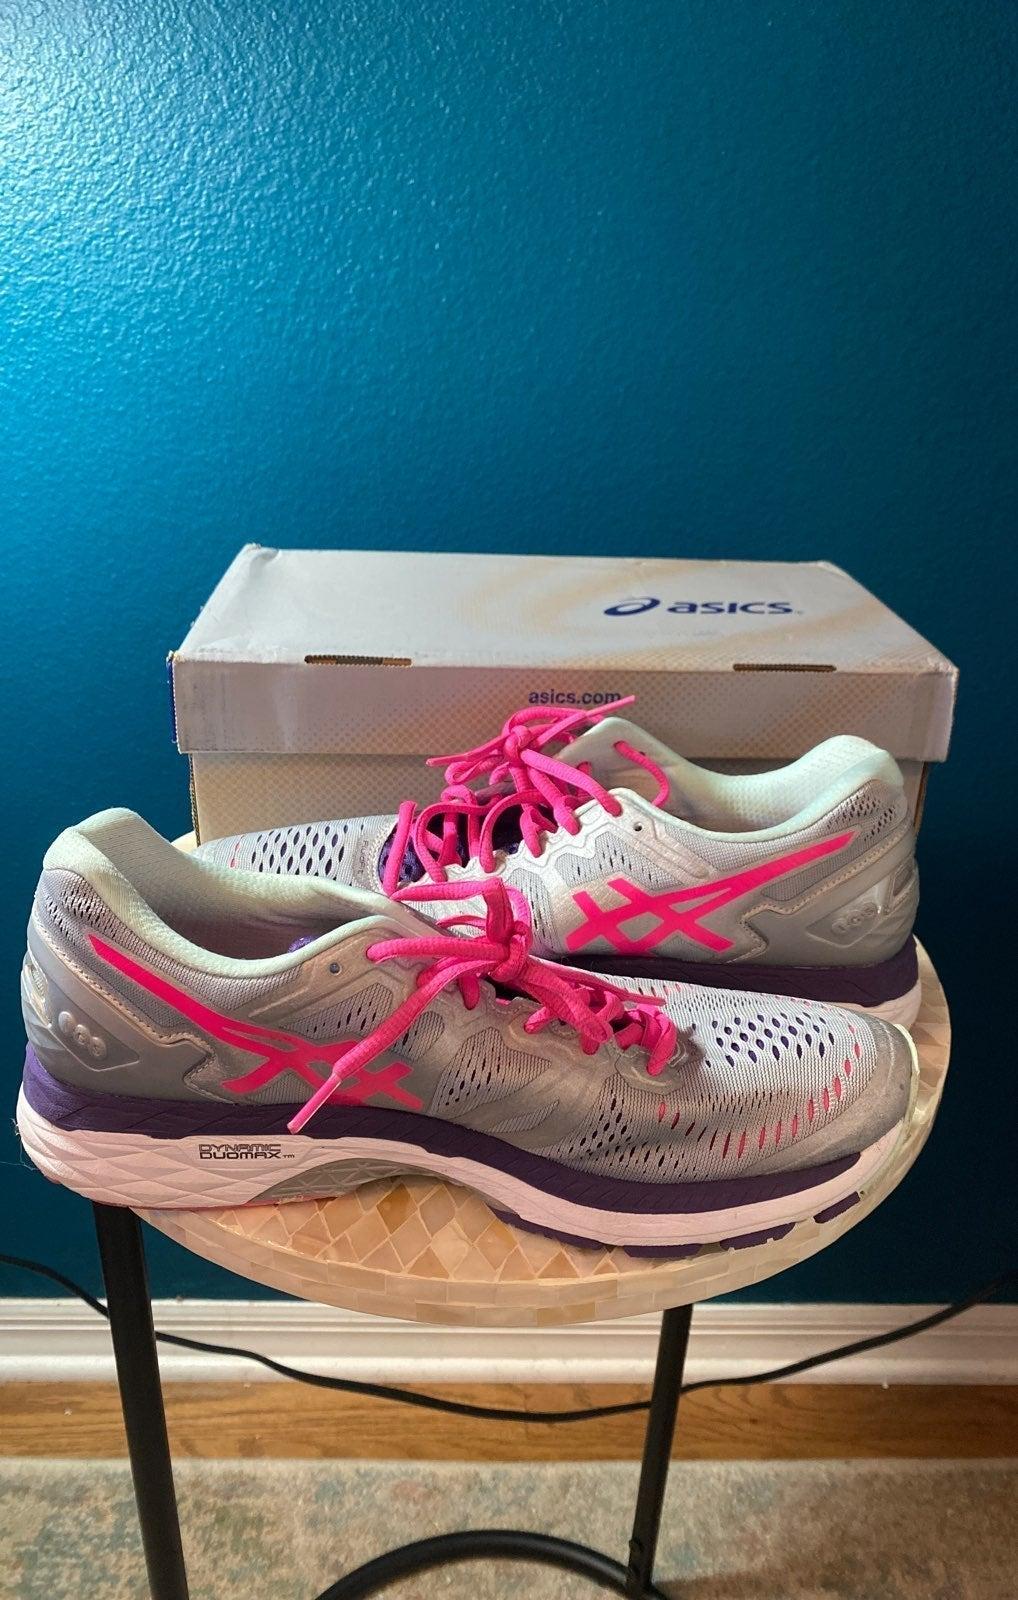 ASICS GEL-Kayano 11 Athletic Shoes